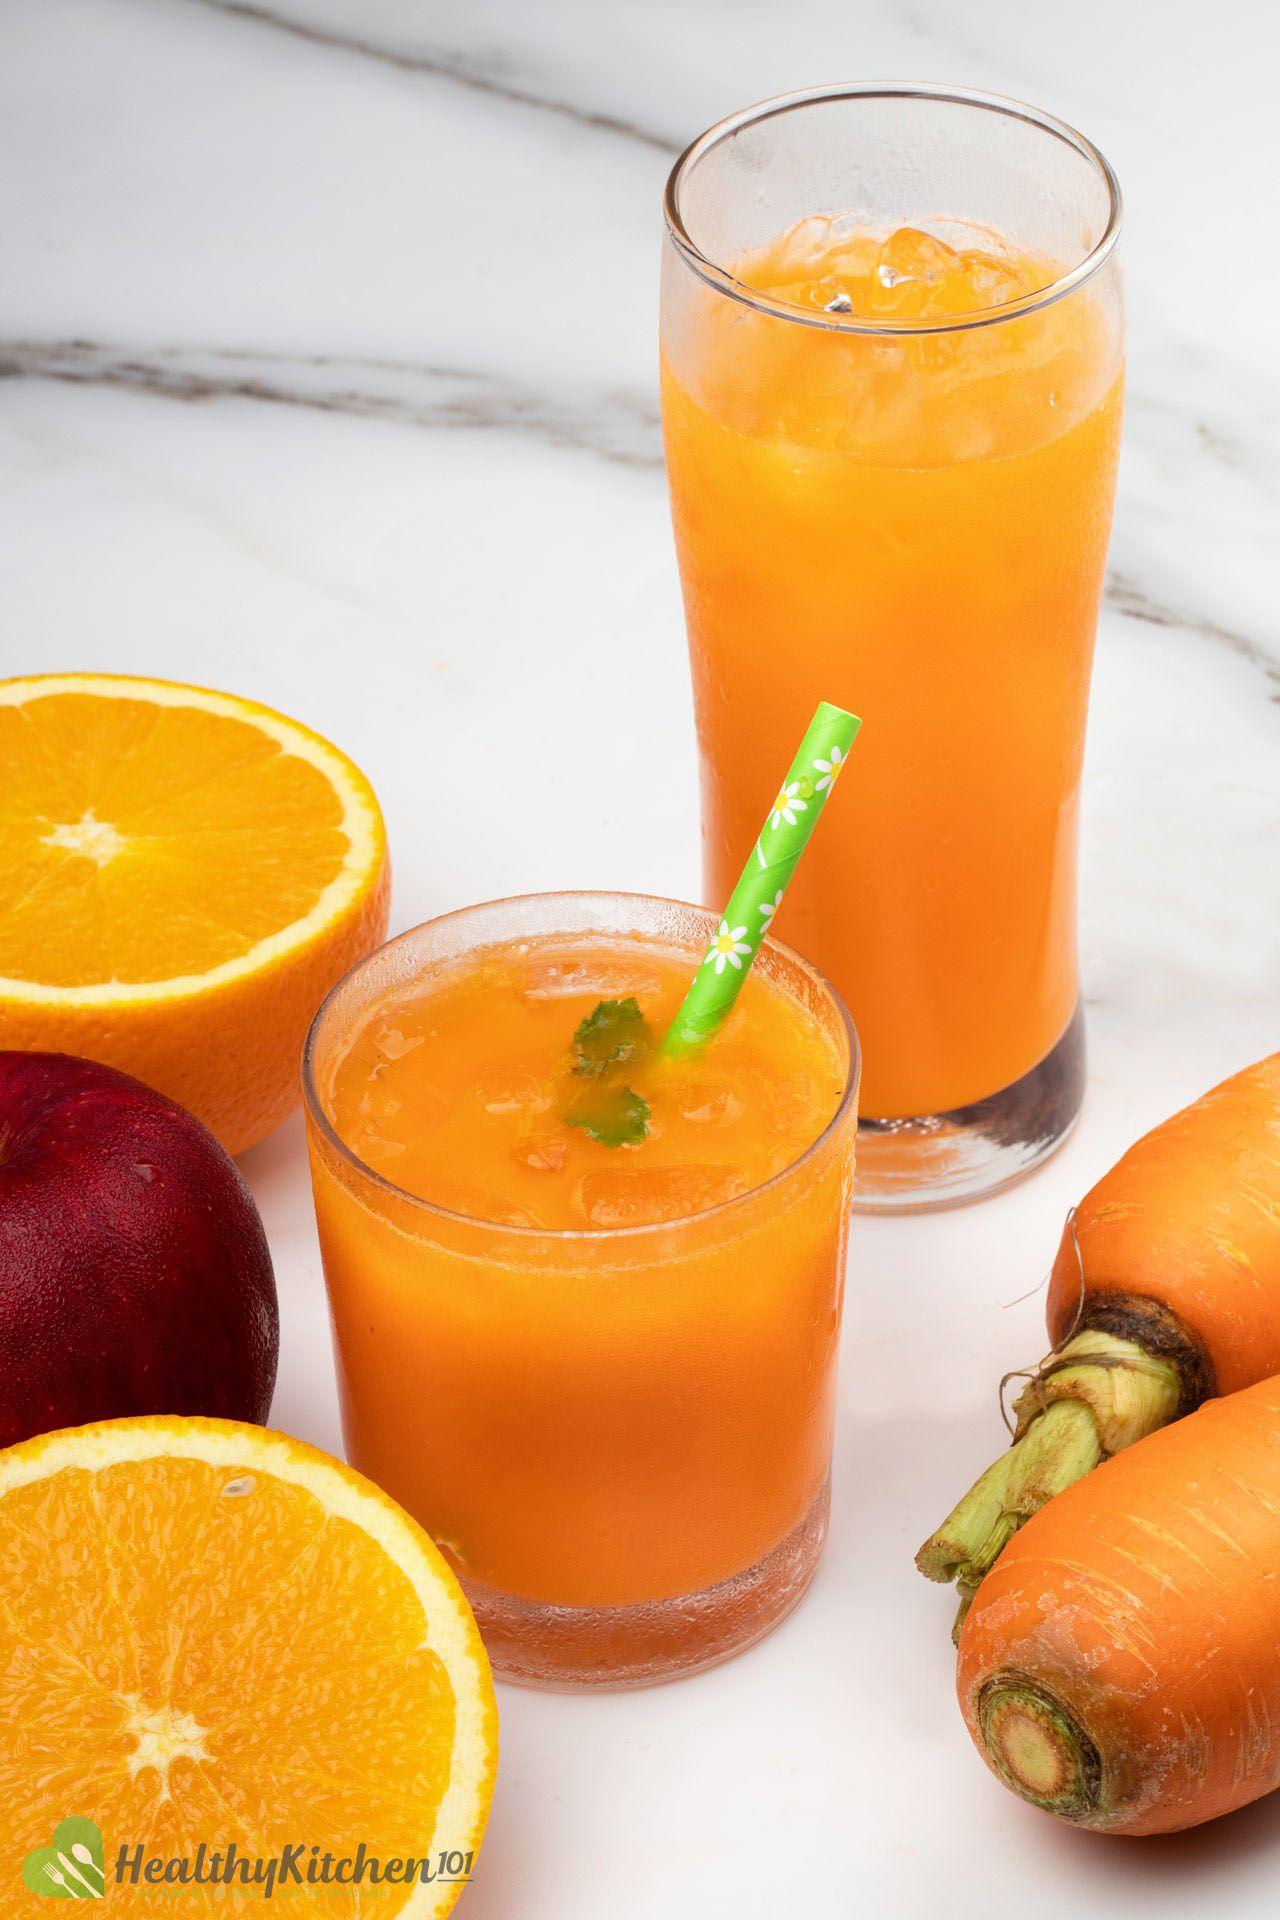 Homemade Carrot Apple Juice Recipe